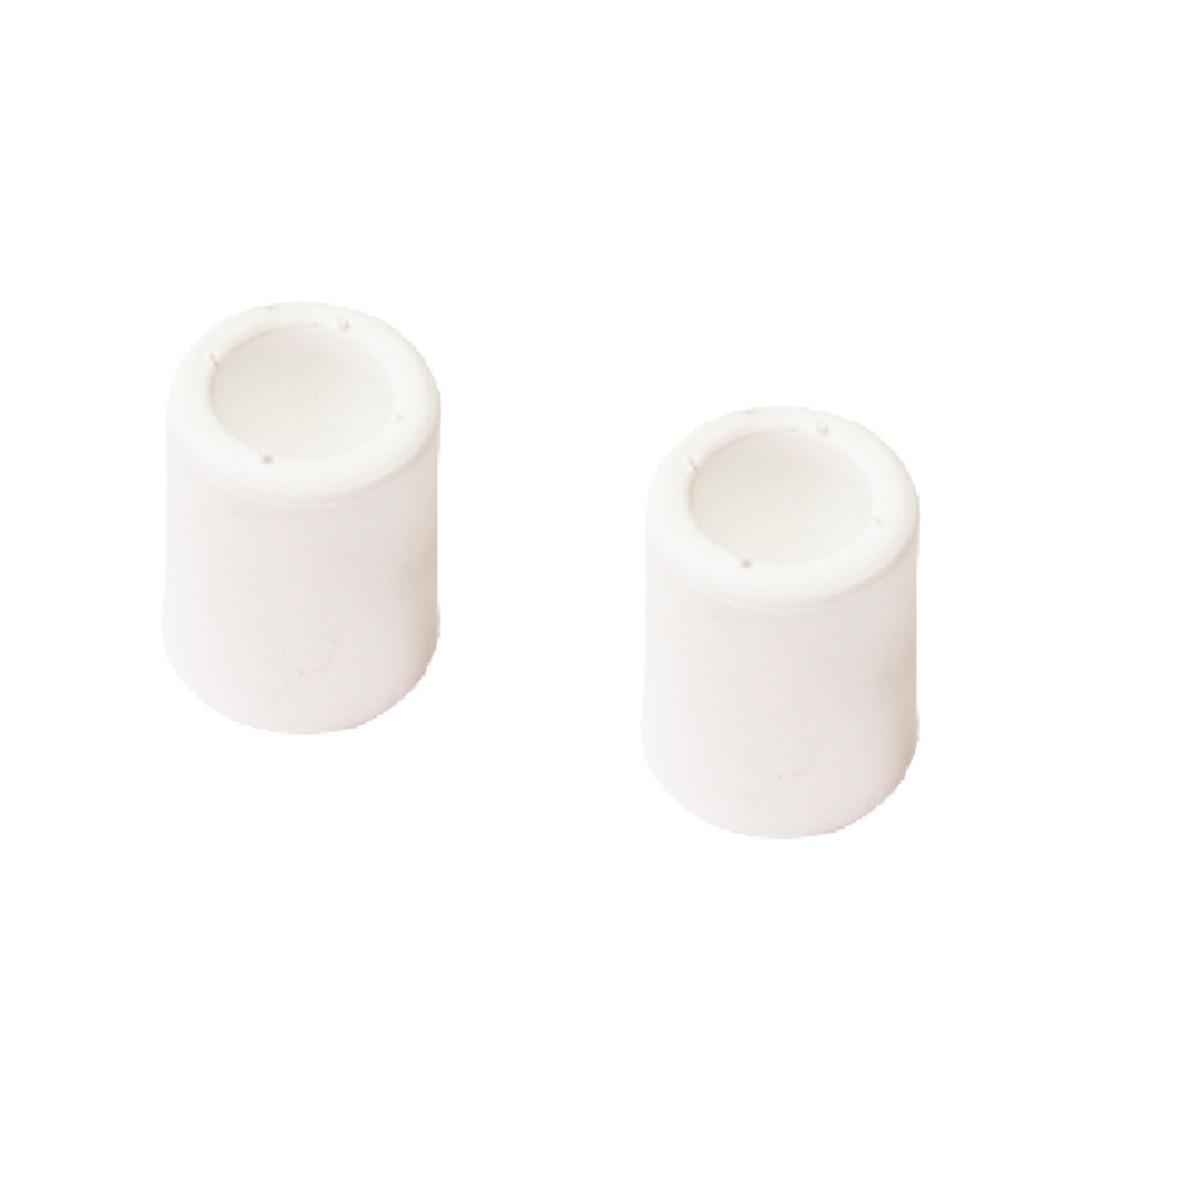 2x stuks deurstopper - deurbuffer rubber wit 60 mm